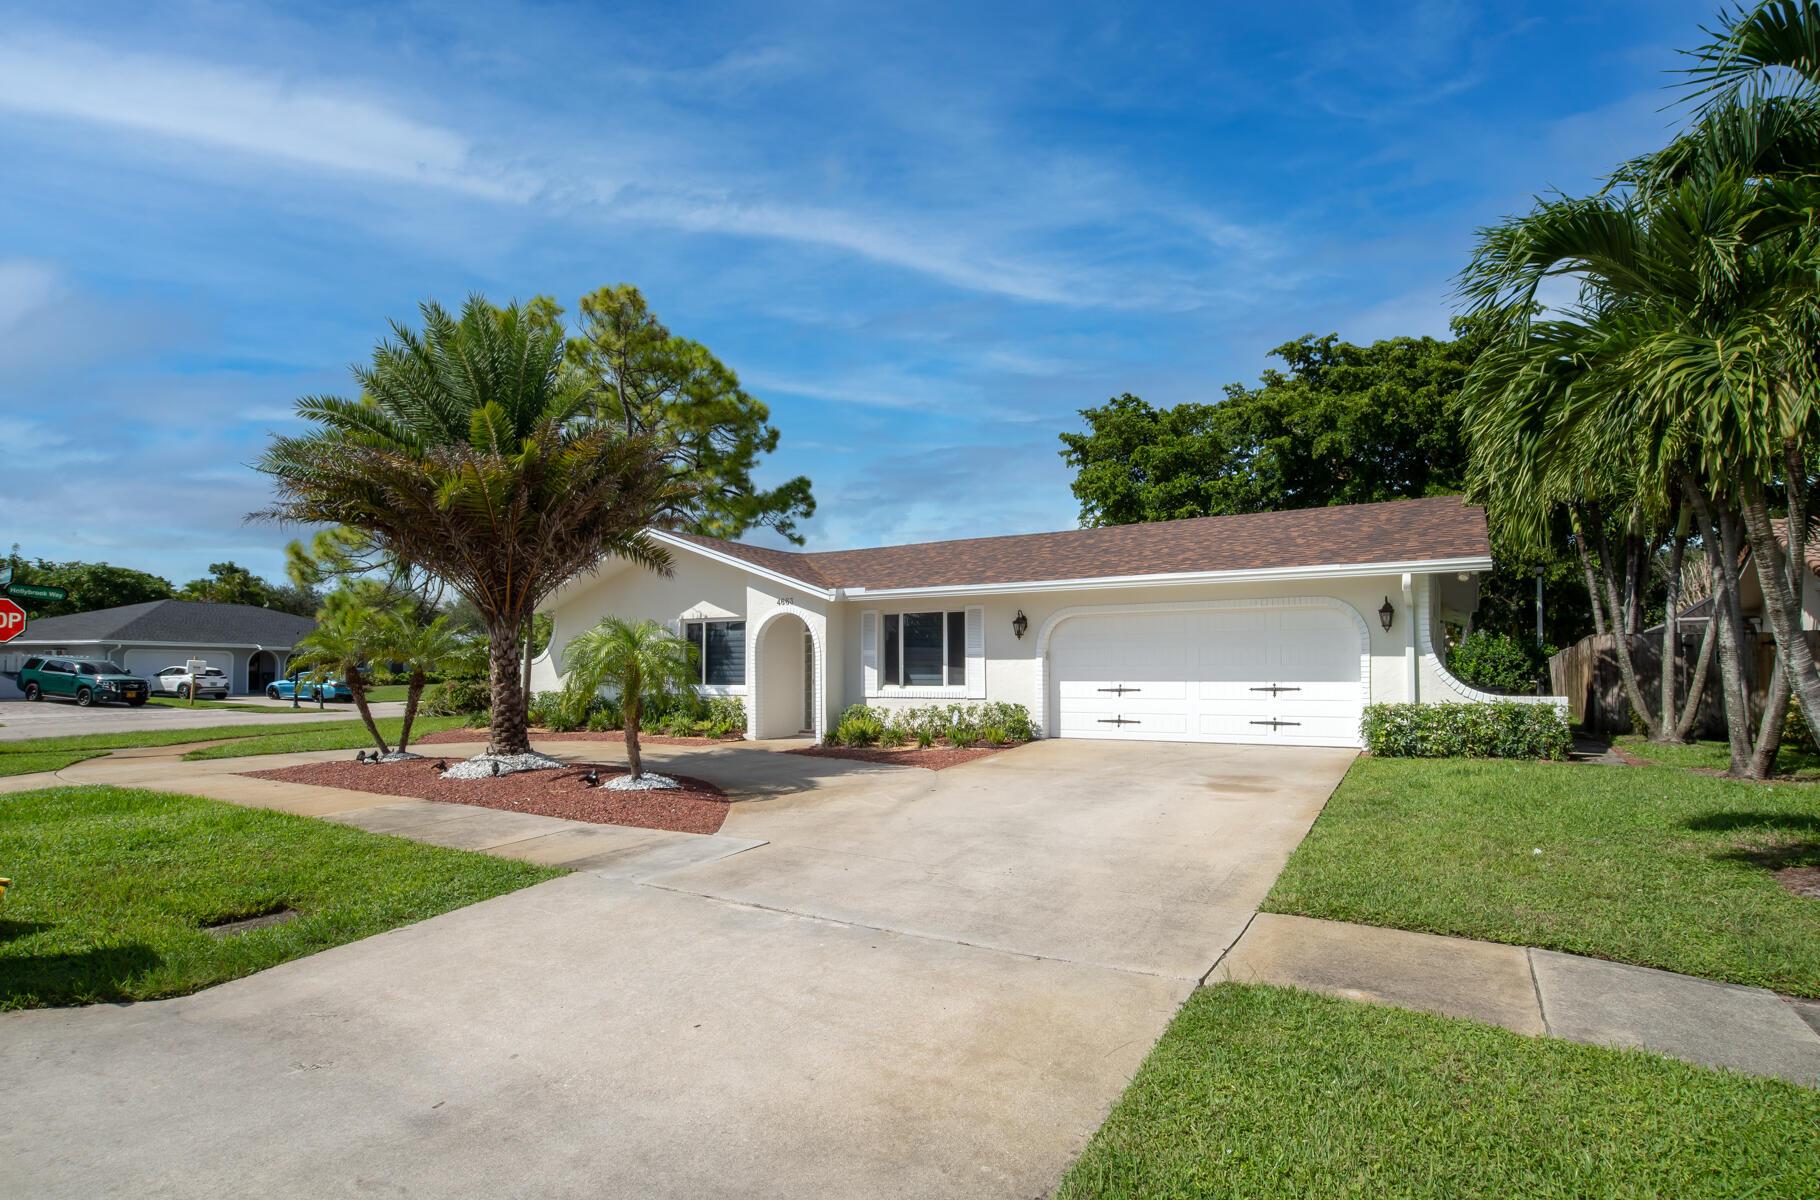 4663 Sugar Pine Drive, Boca Raton, FL 33487